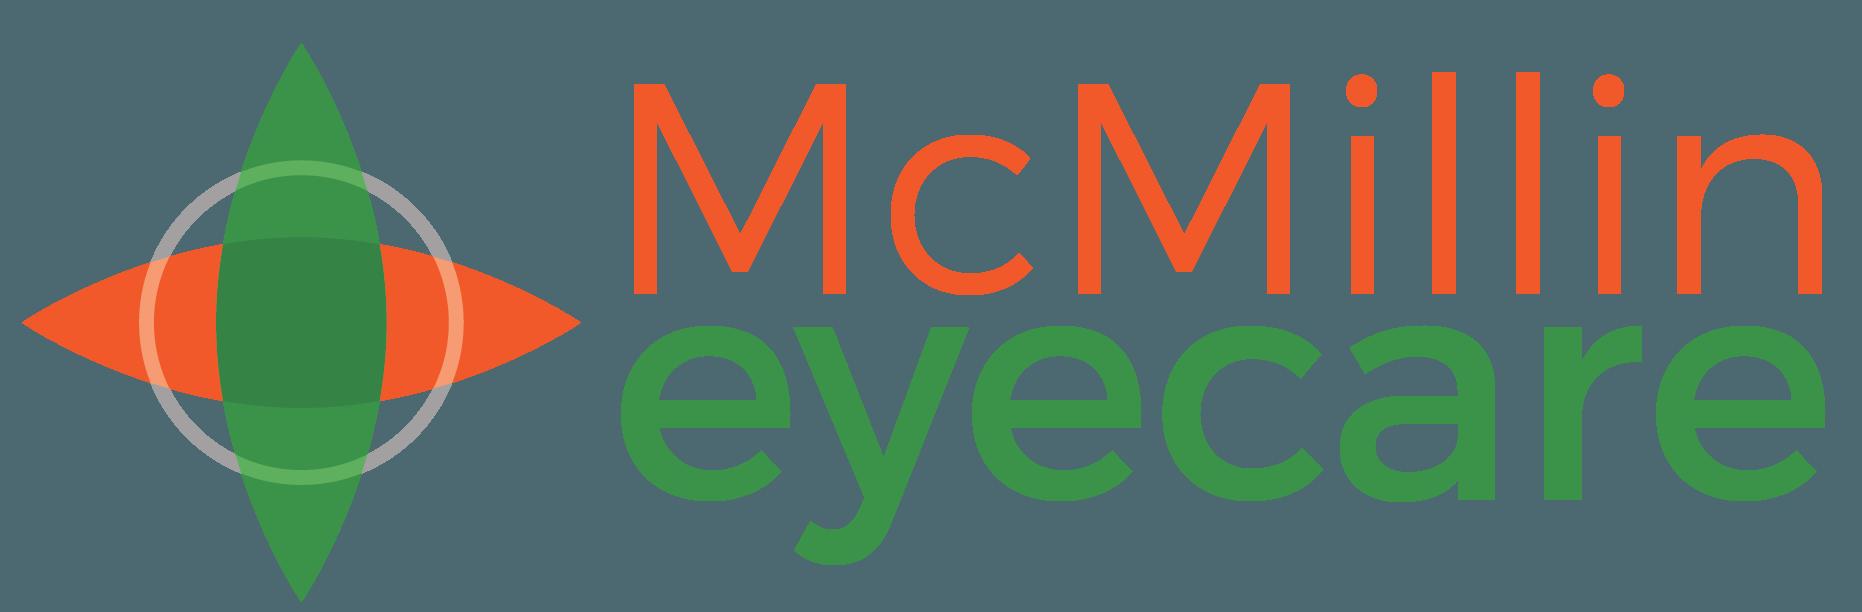 mcmillin-eyecare-logo-01